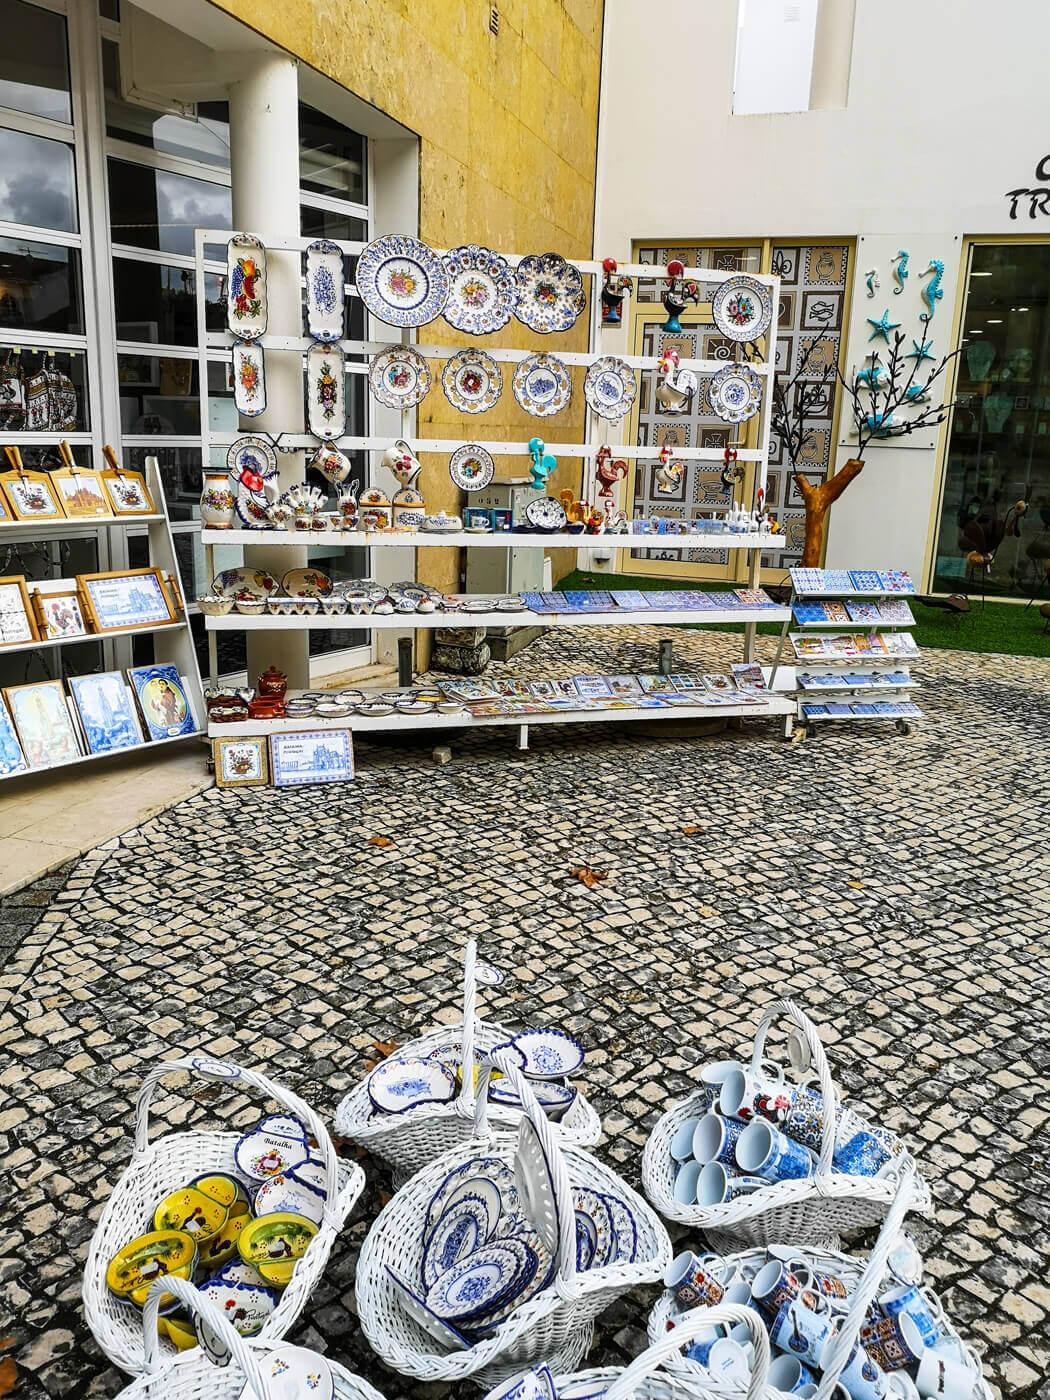 A gift shop display full of china plates, mugs and tiles.